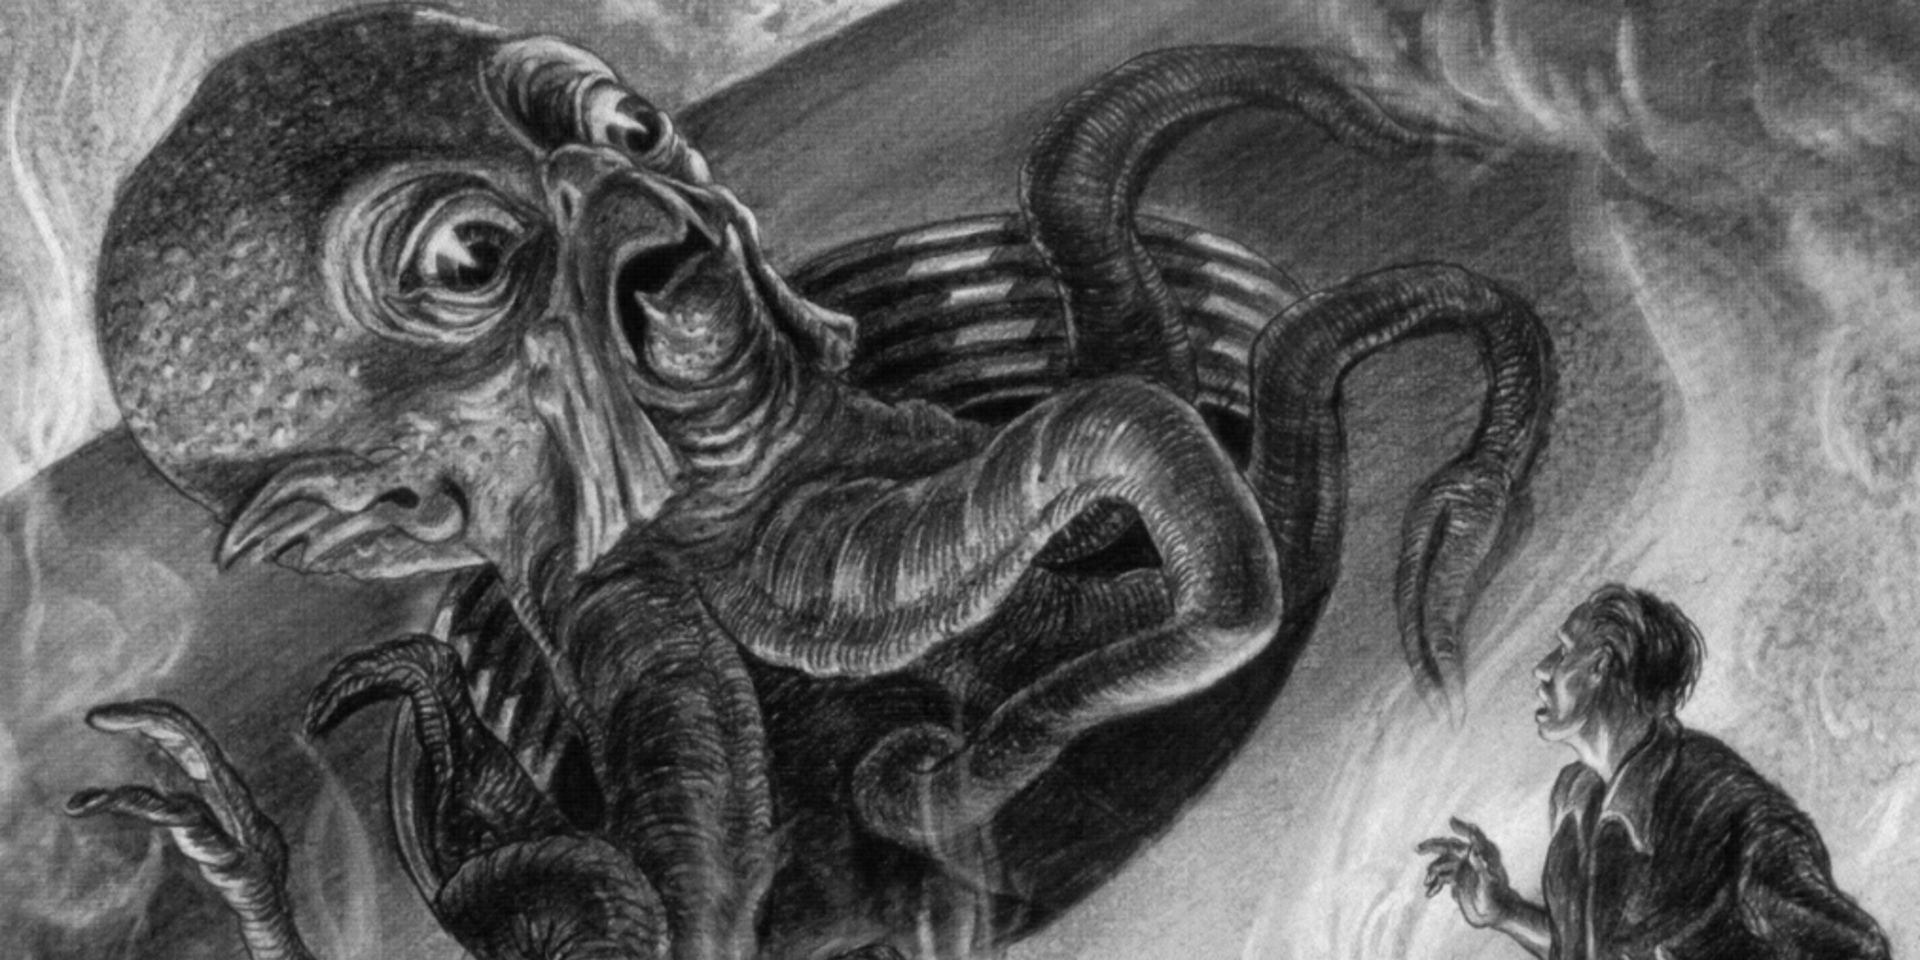 Watch Film Legend Ray Harryhausen's Concept Footage For War Of The Worlds